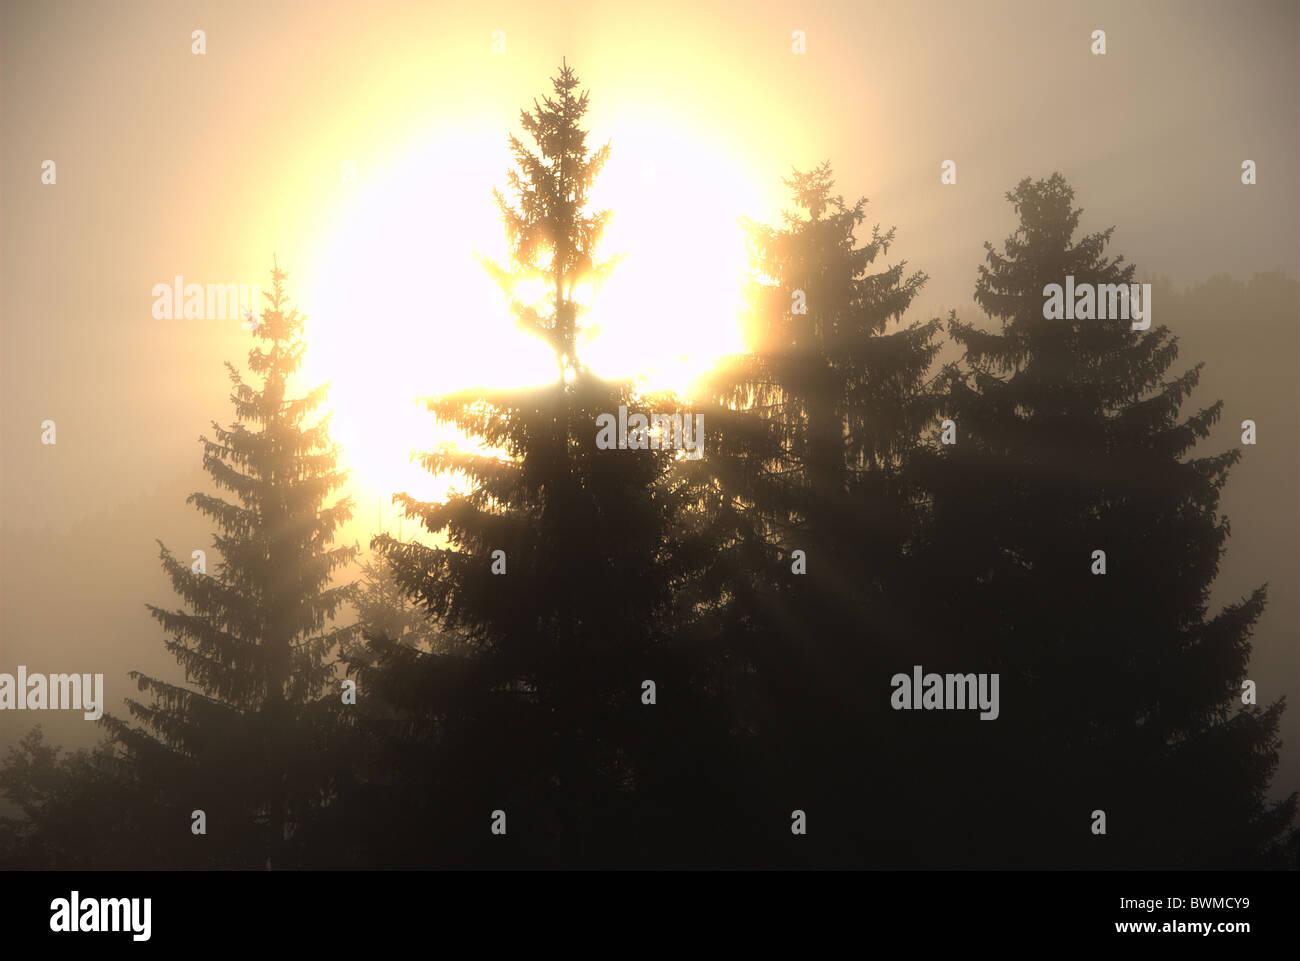 Deutschland Europa Schwarzwald Titisee Holz Wald Sonnenaufgang Bäume Nebel Nebel Sonne Aureole Corona Stimmung Stockbild